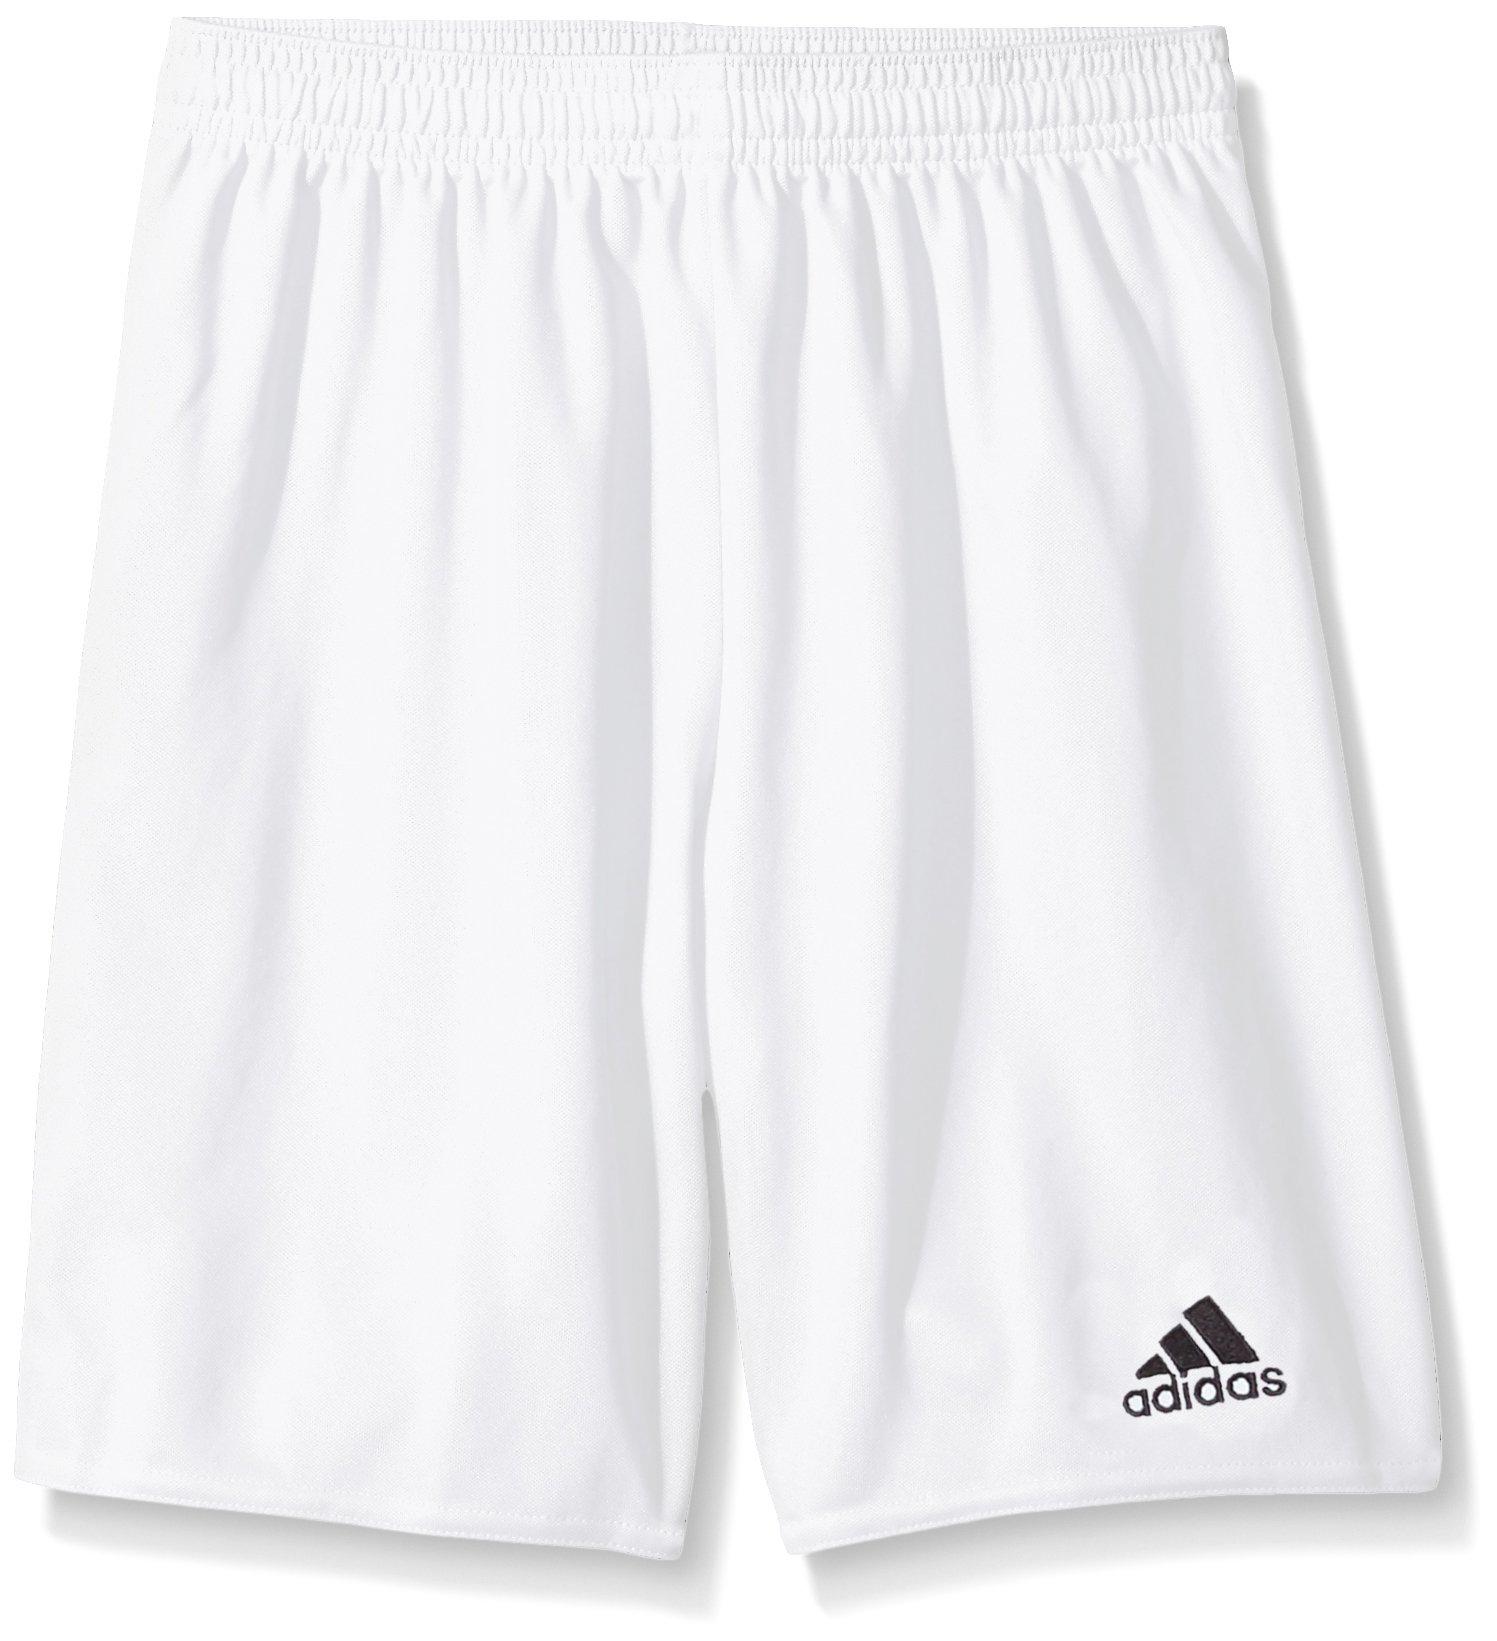 adidas Youth Parma 16 Shorts, White/Black, Medium